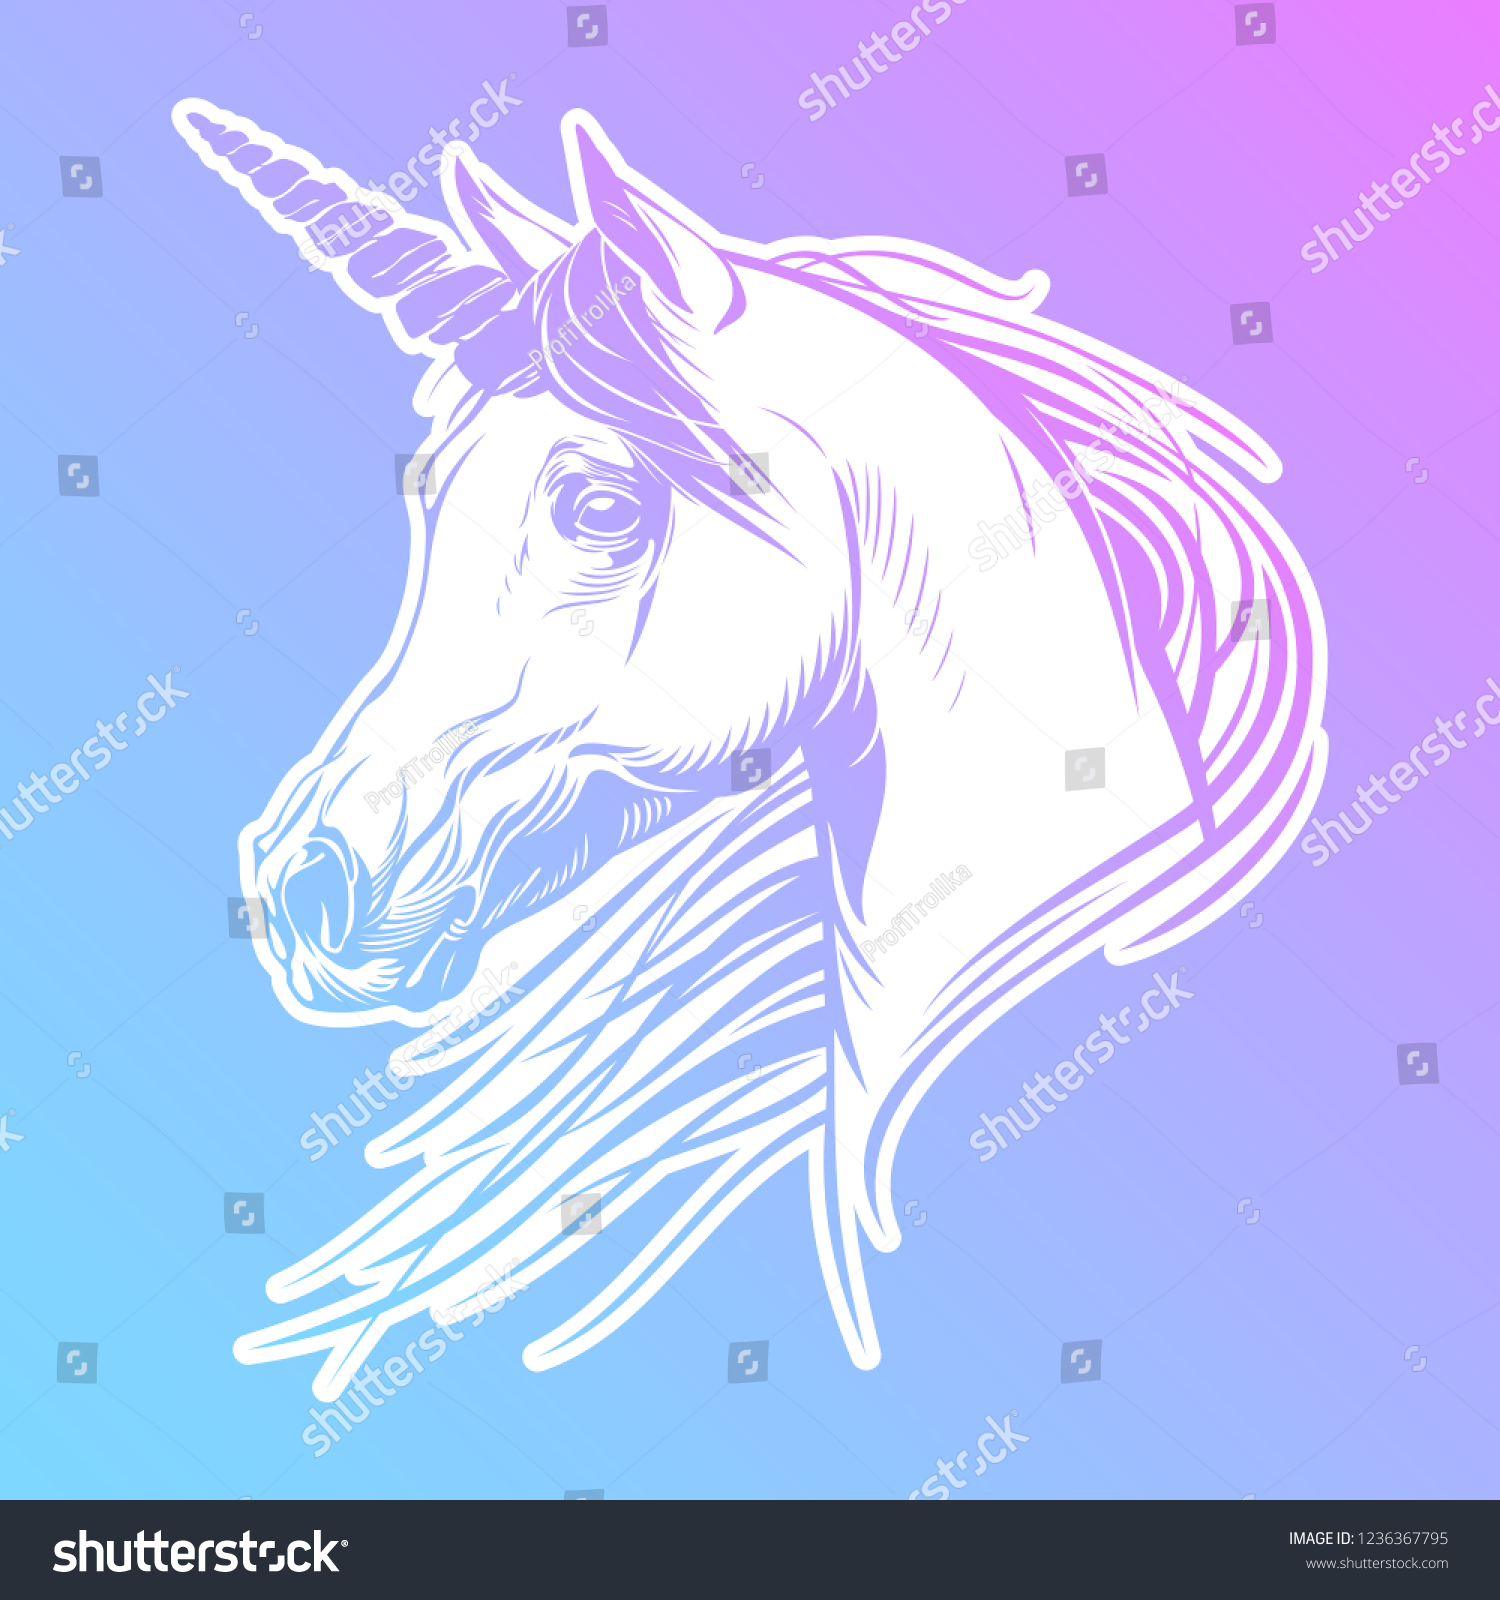 White Unicorn Vector Image Fantasy Horse Stock Vector Royalty Free 1236367795